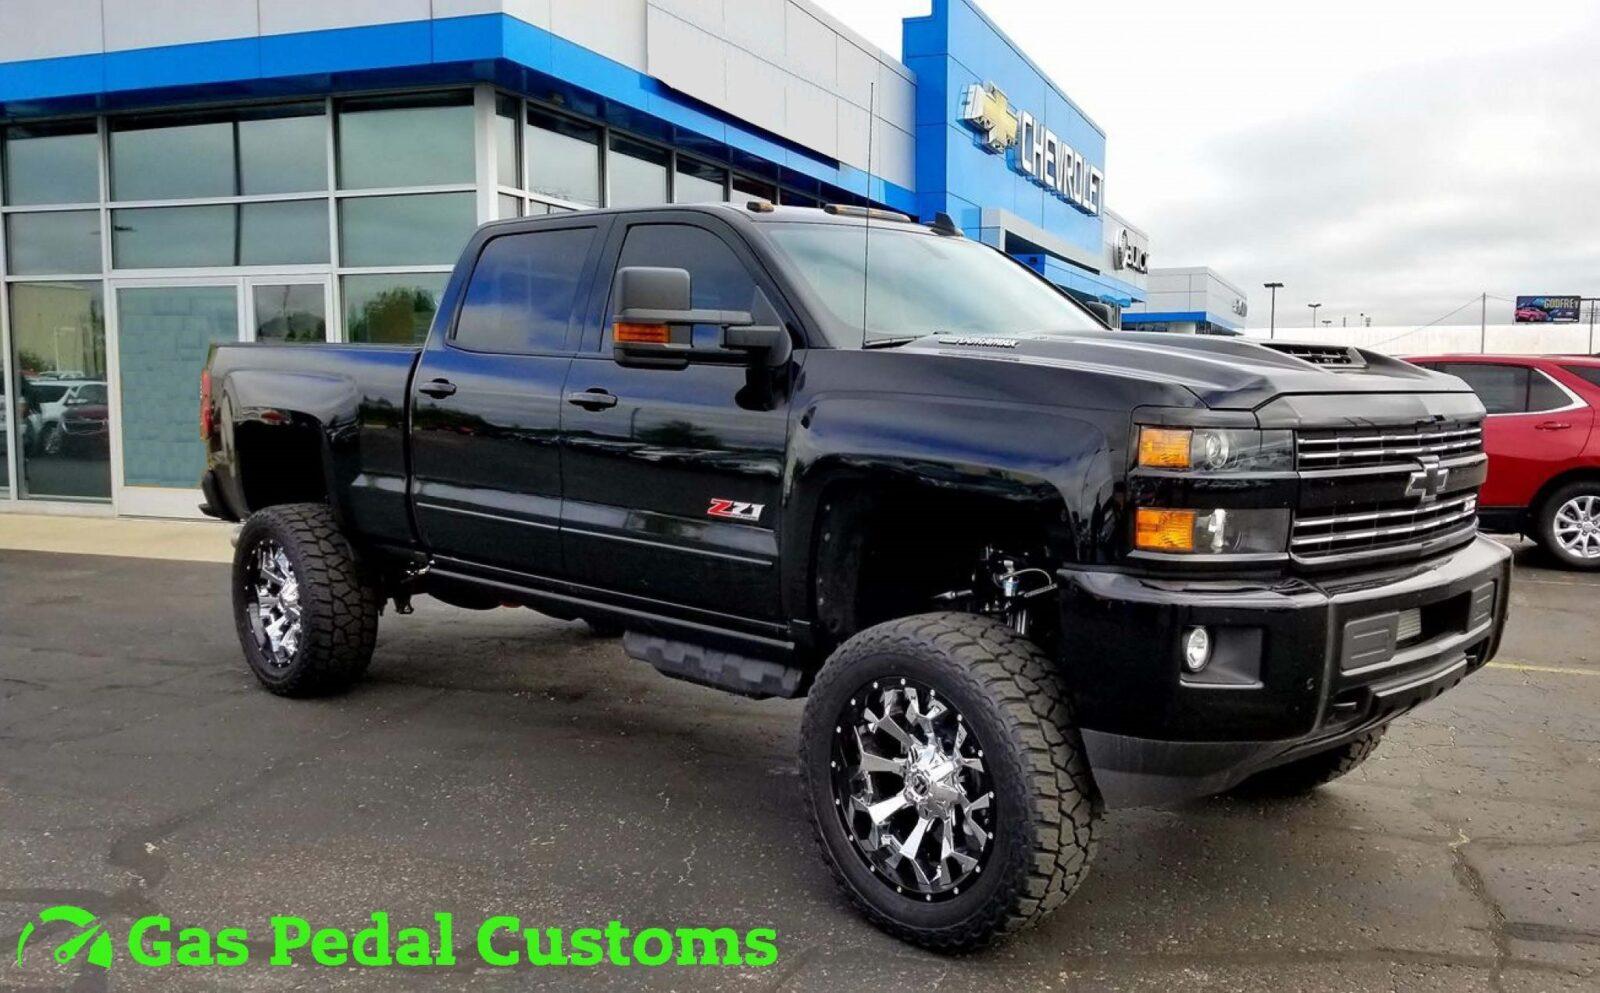 Custom Built Trucks - Gas Pedal Customs - Automotive Customizing